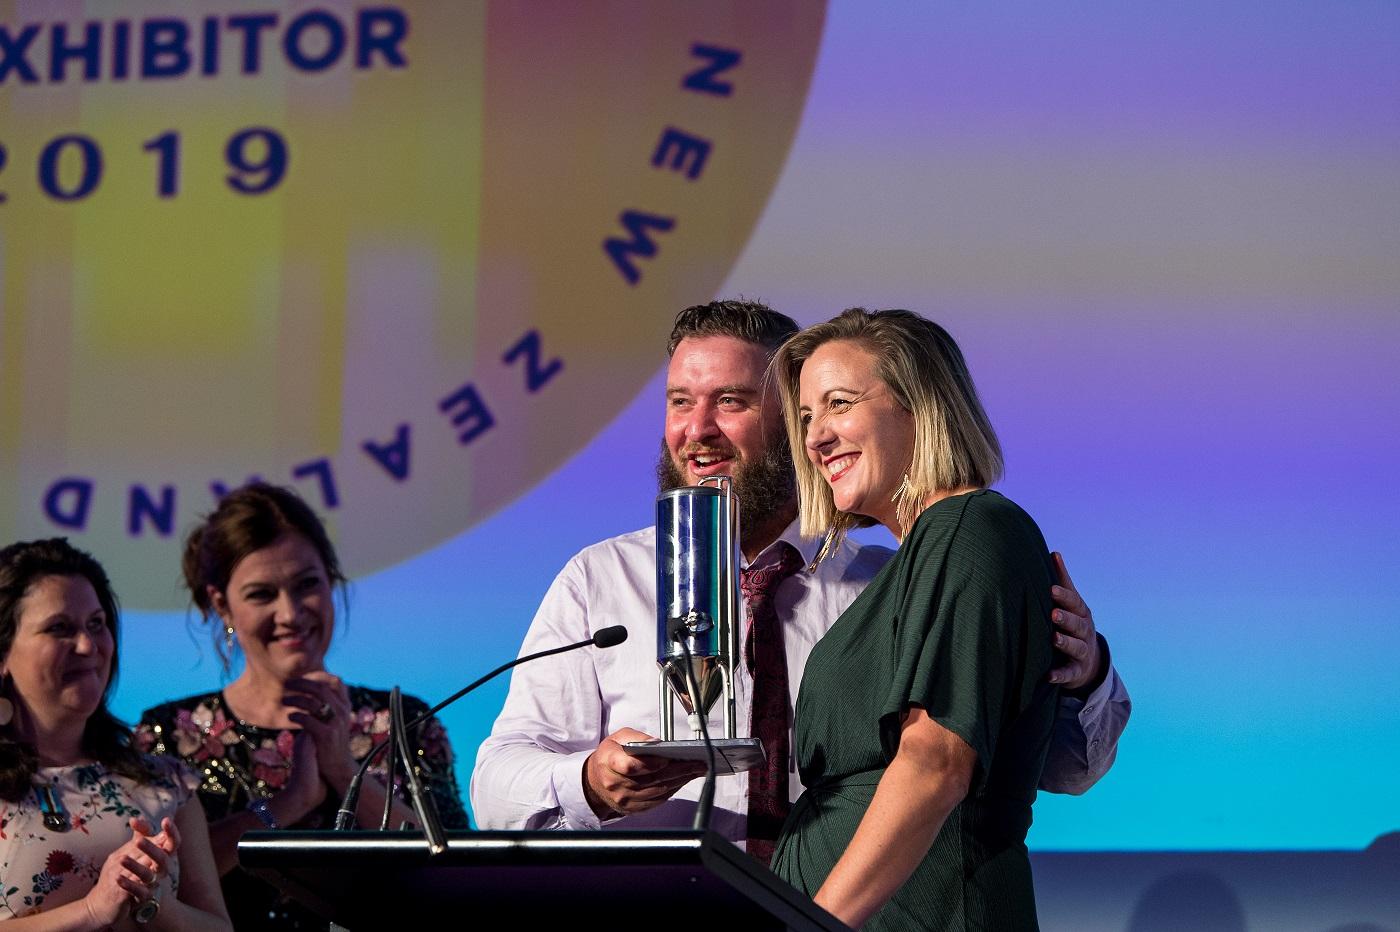 New Zealand Beer Awards Dinner